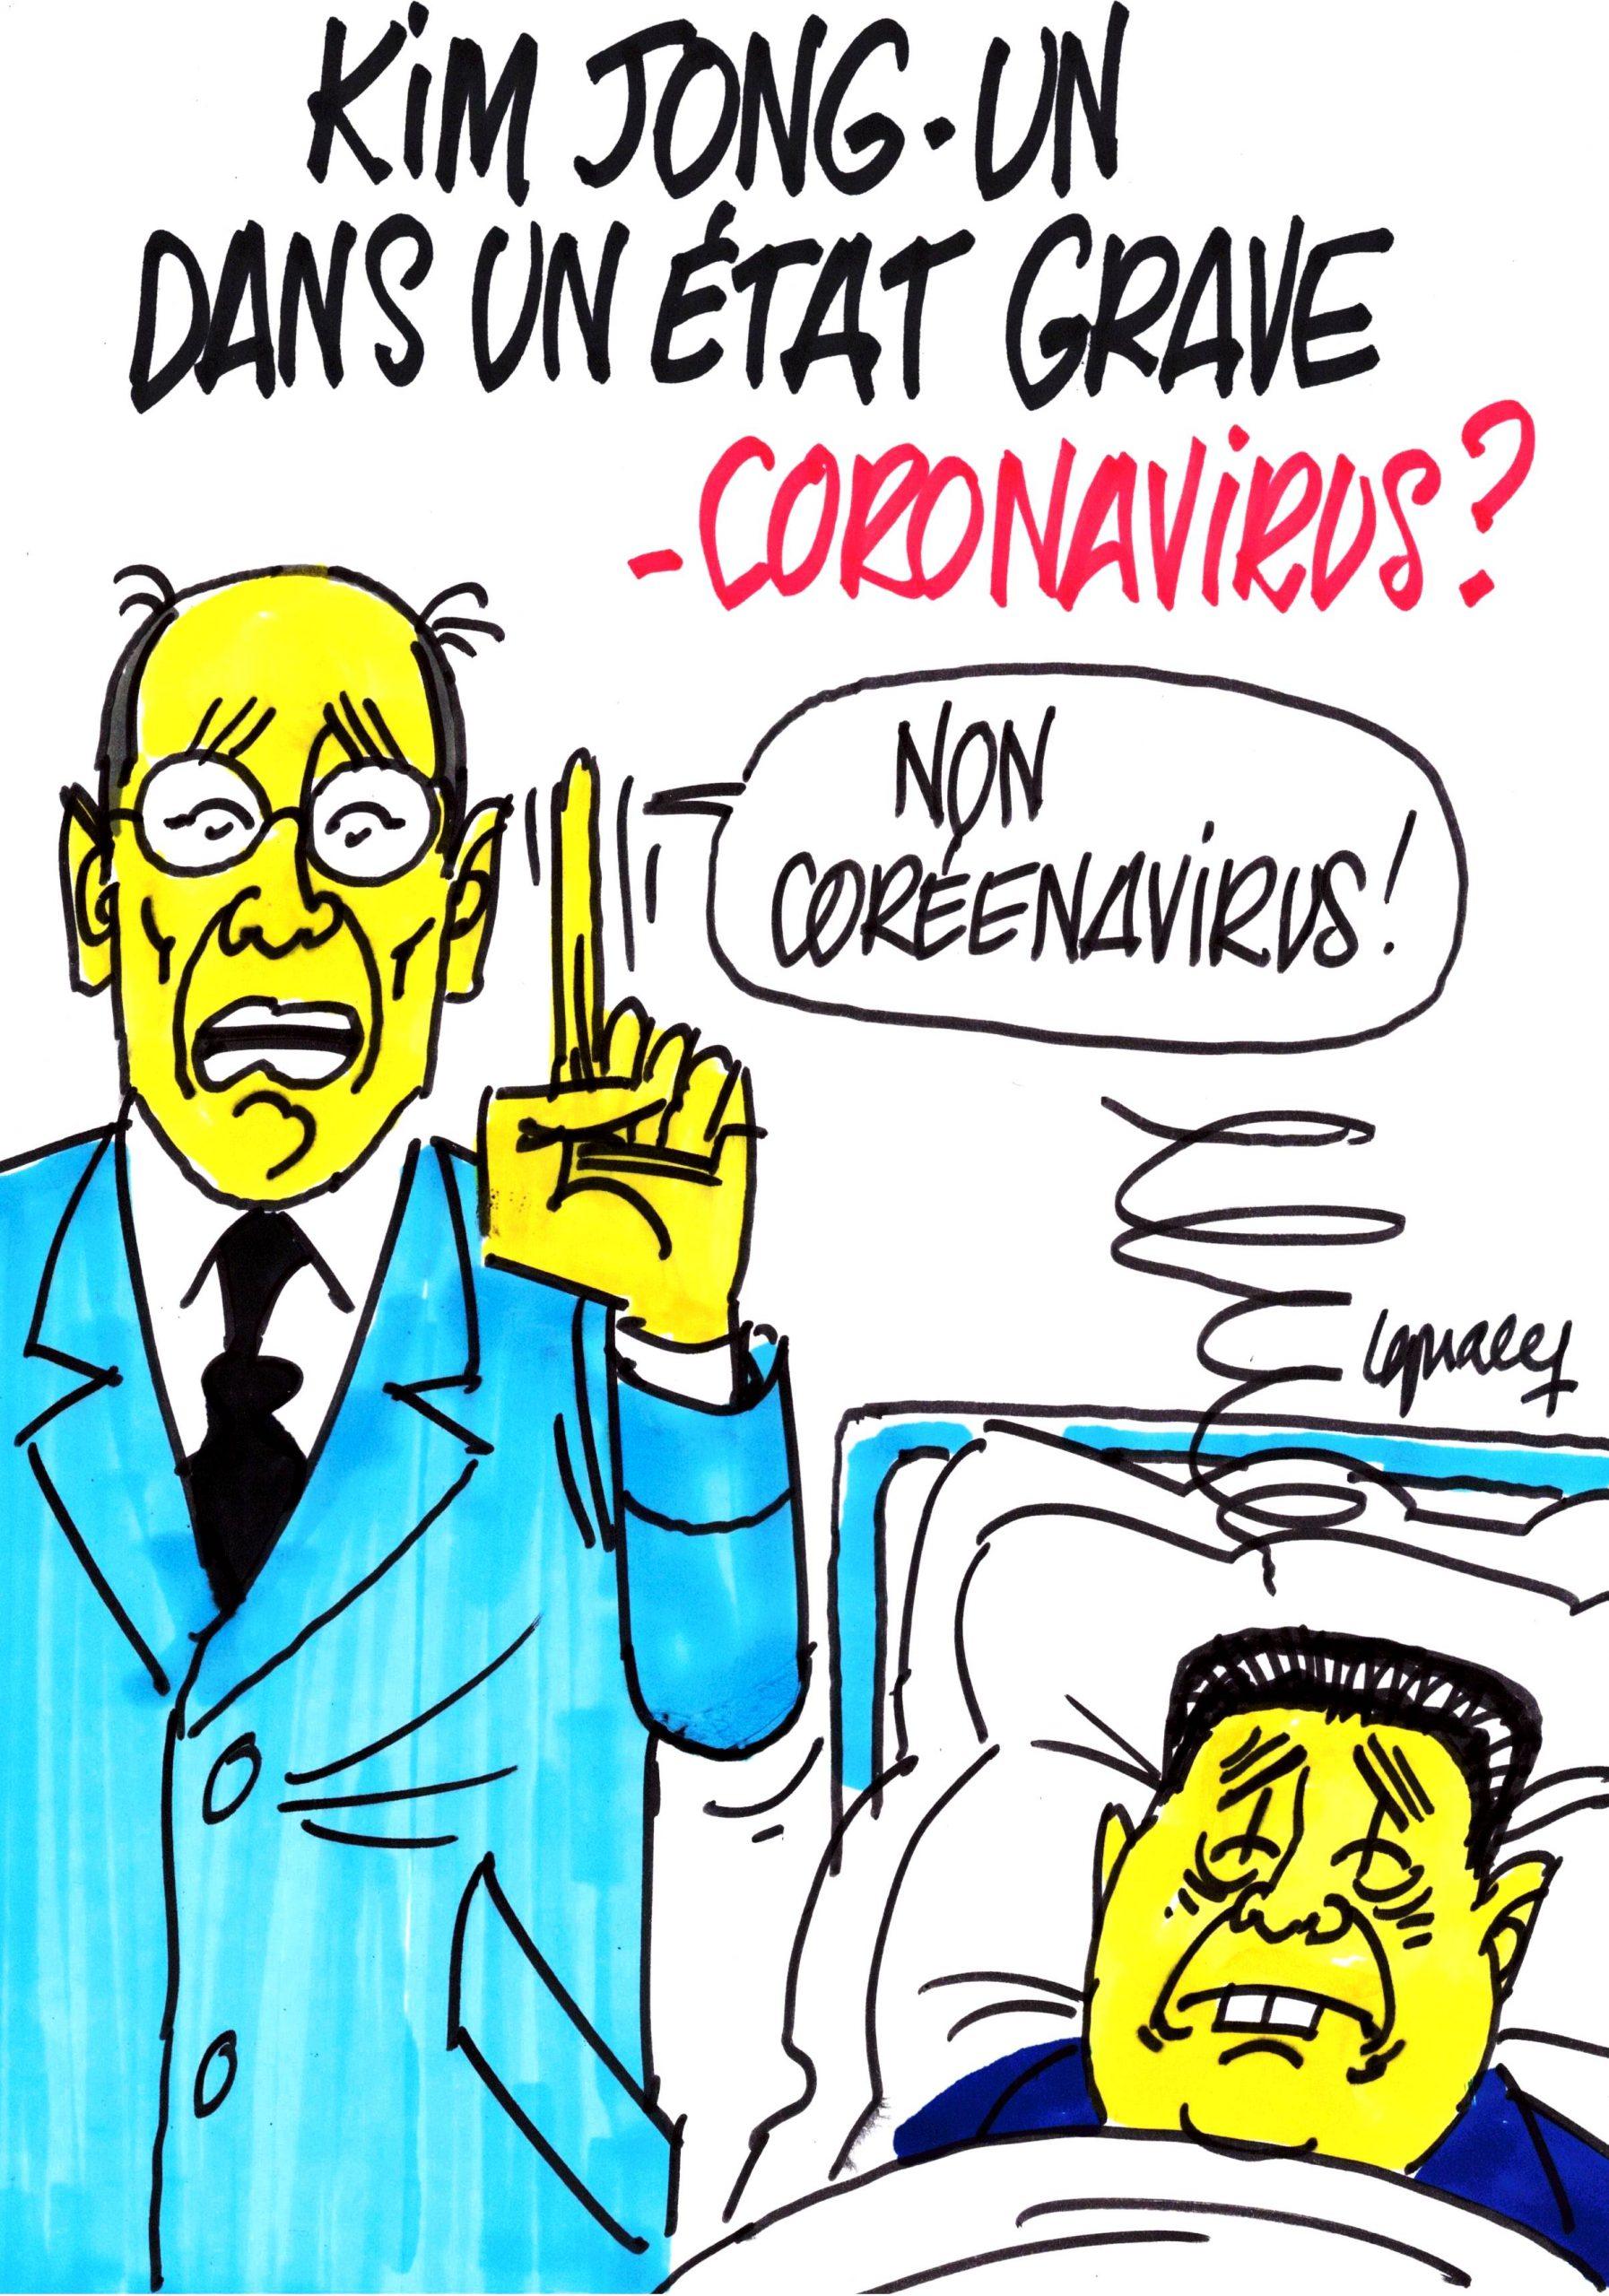 Ignace - Kim Jong-un malade, coronavirus ?